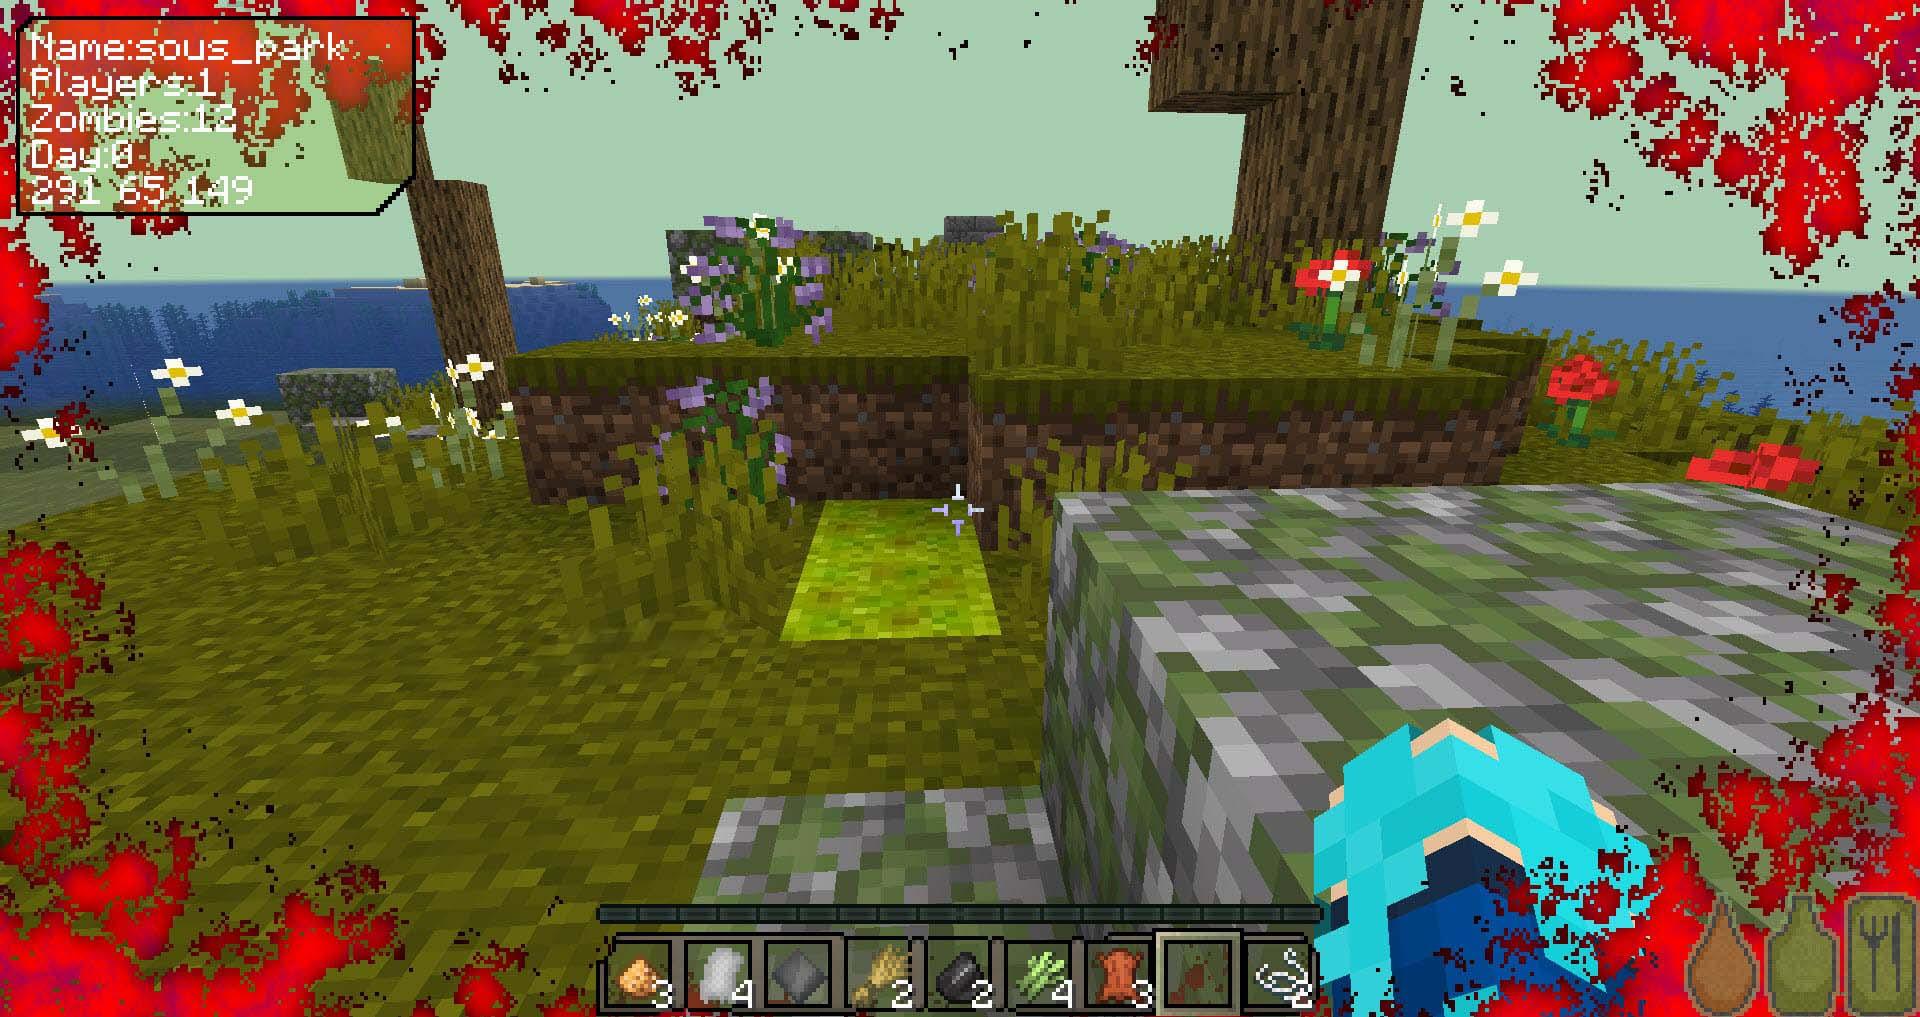 DayZ Remastered зомби апокалипсис в Майнкрафт